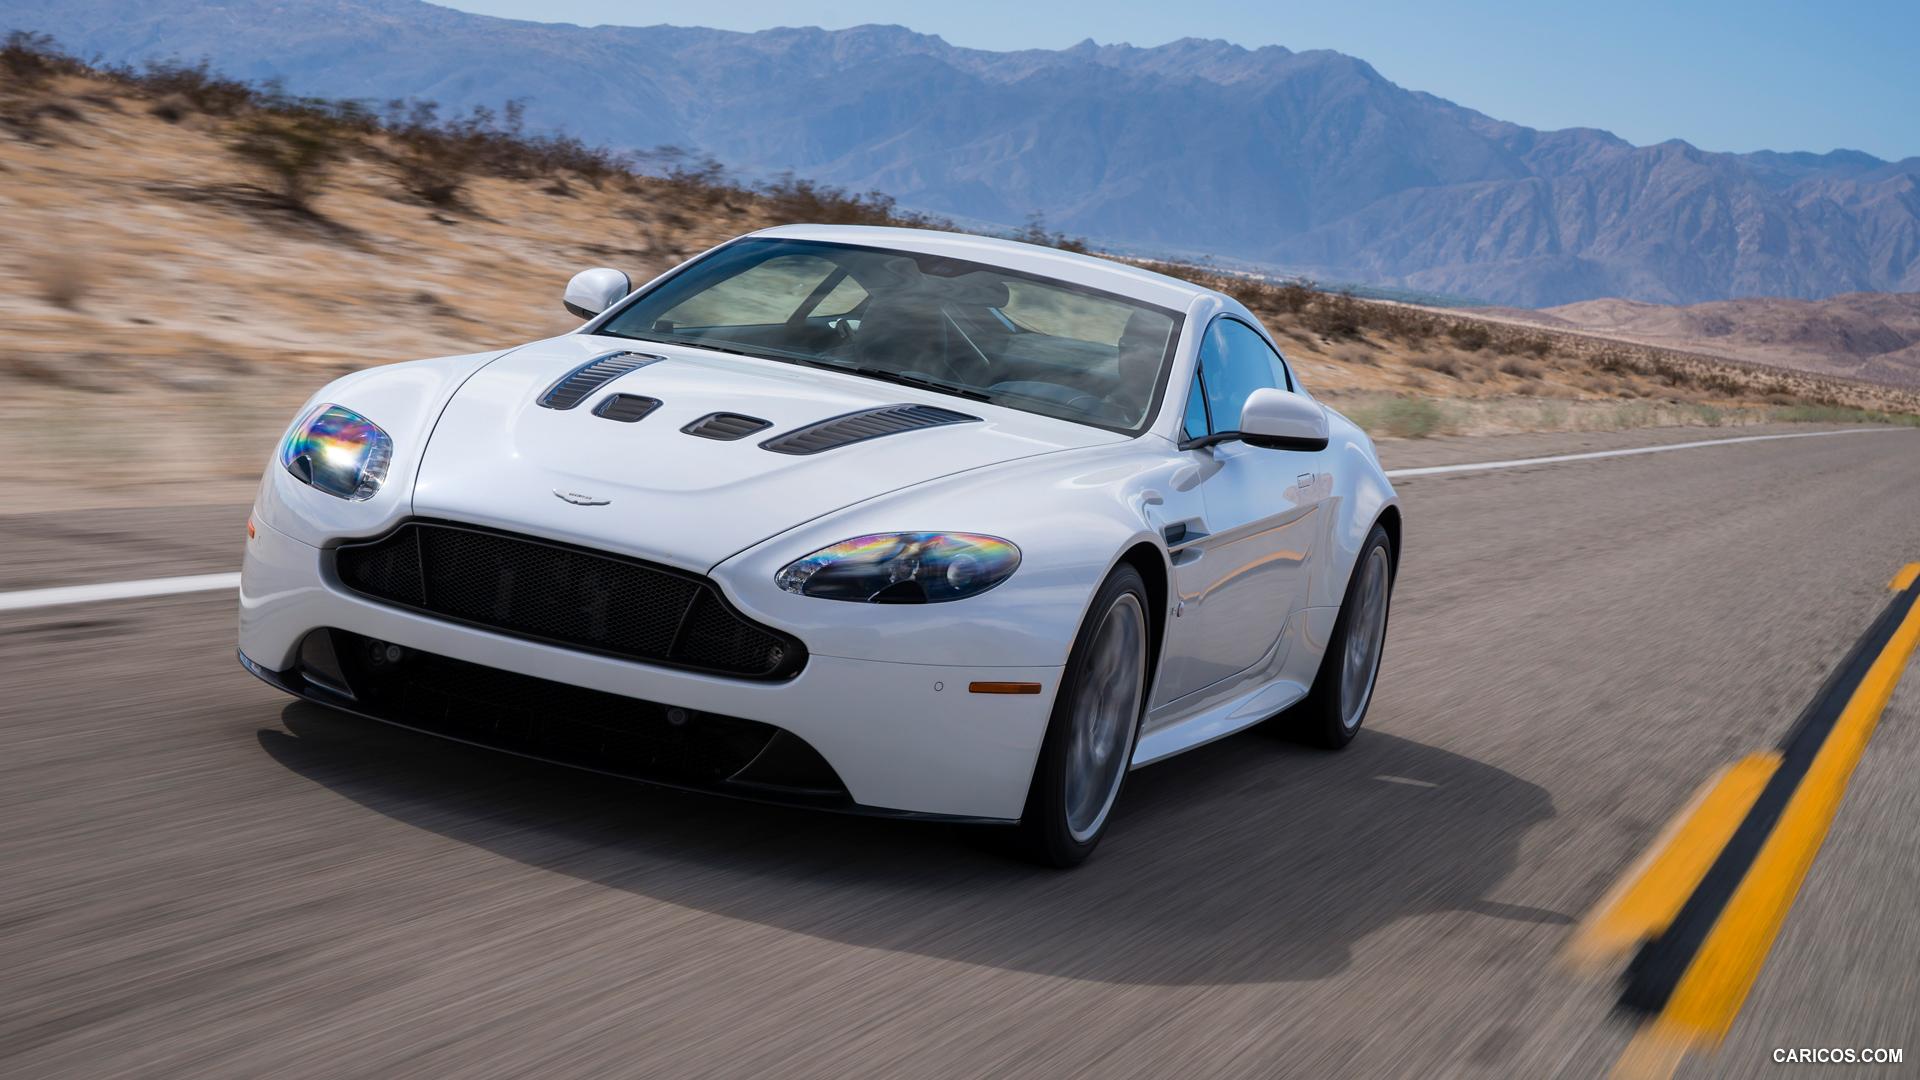 HQ 2014 Aston Martin V12 Vantage S Wallpapers | File 789.23Kb